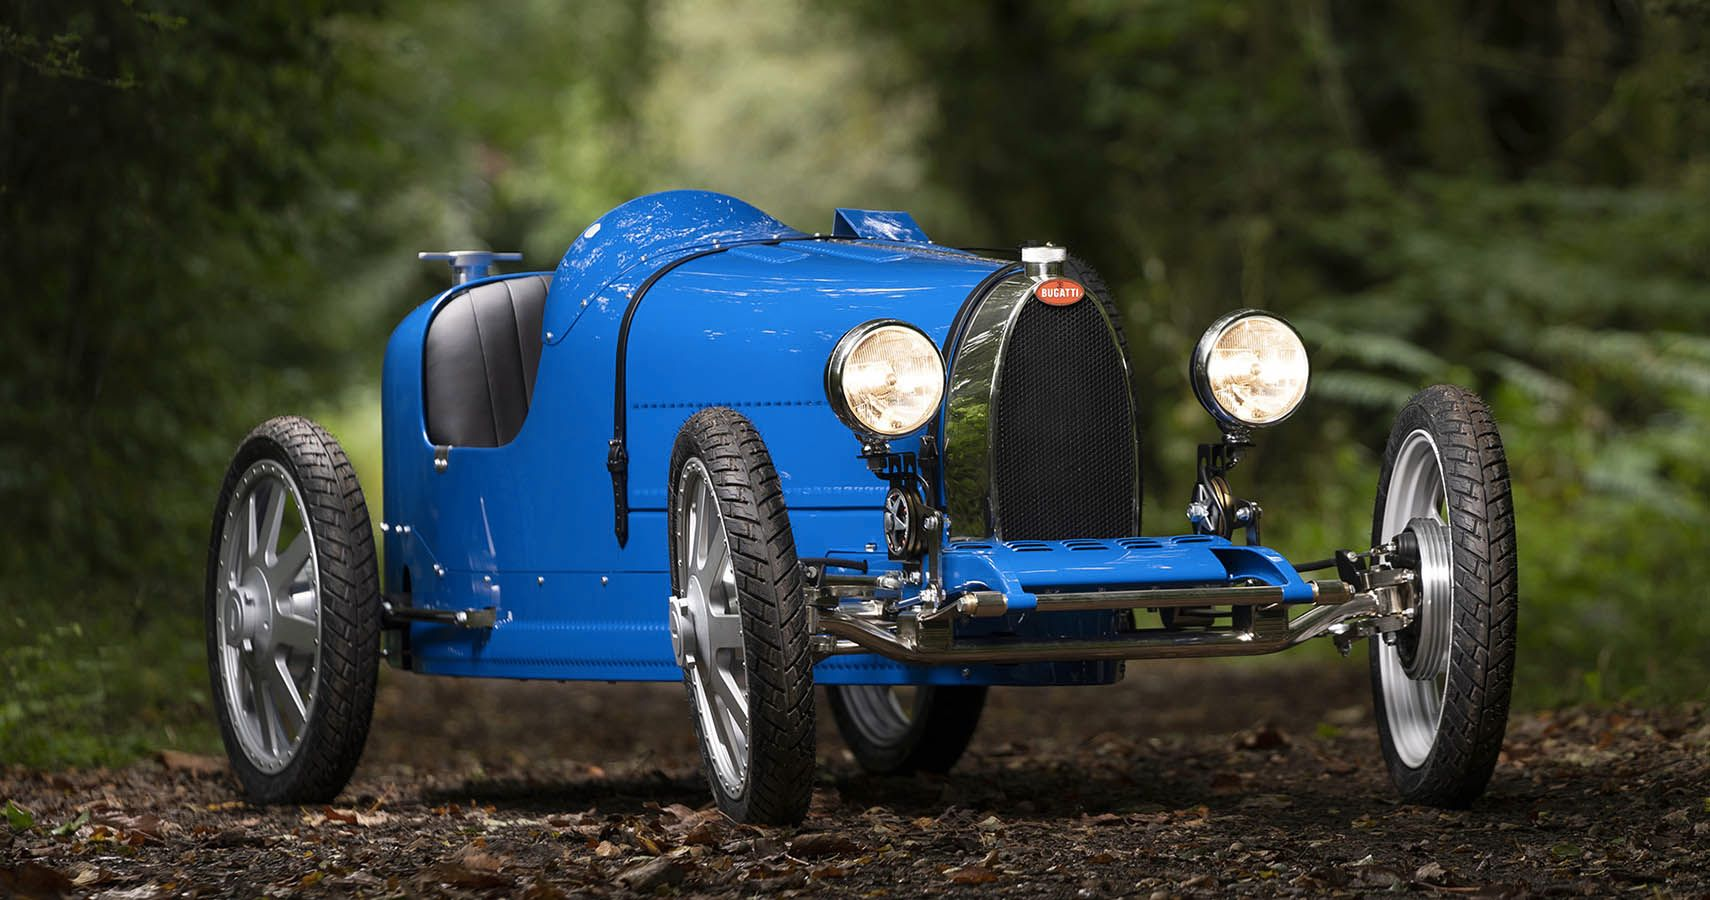 Bugatti Building Limited Edition Run Of Baby II Boattails